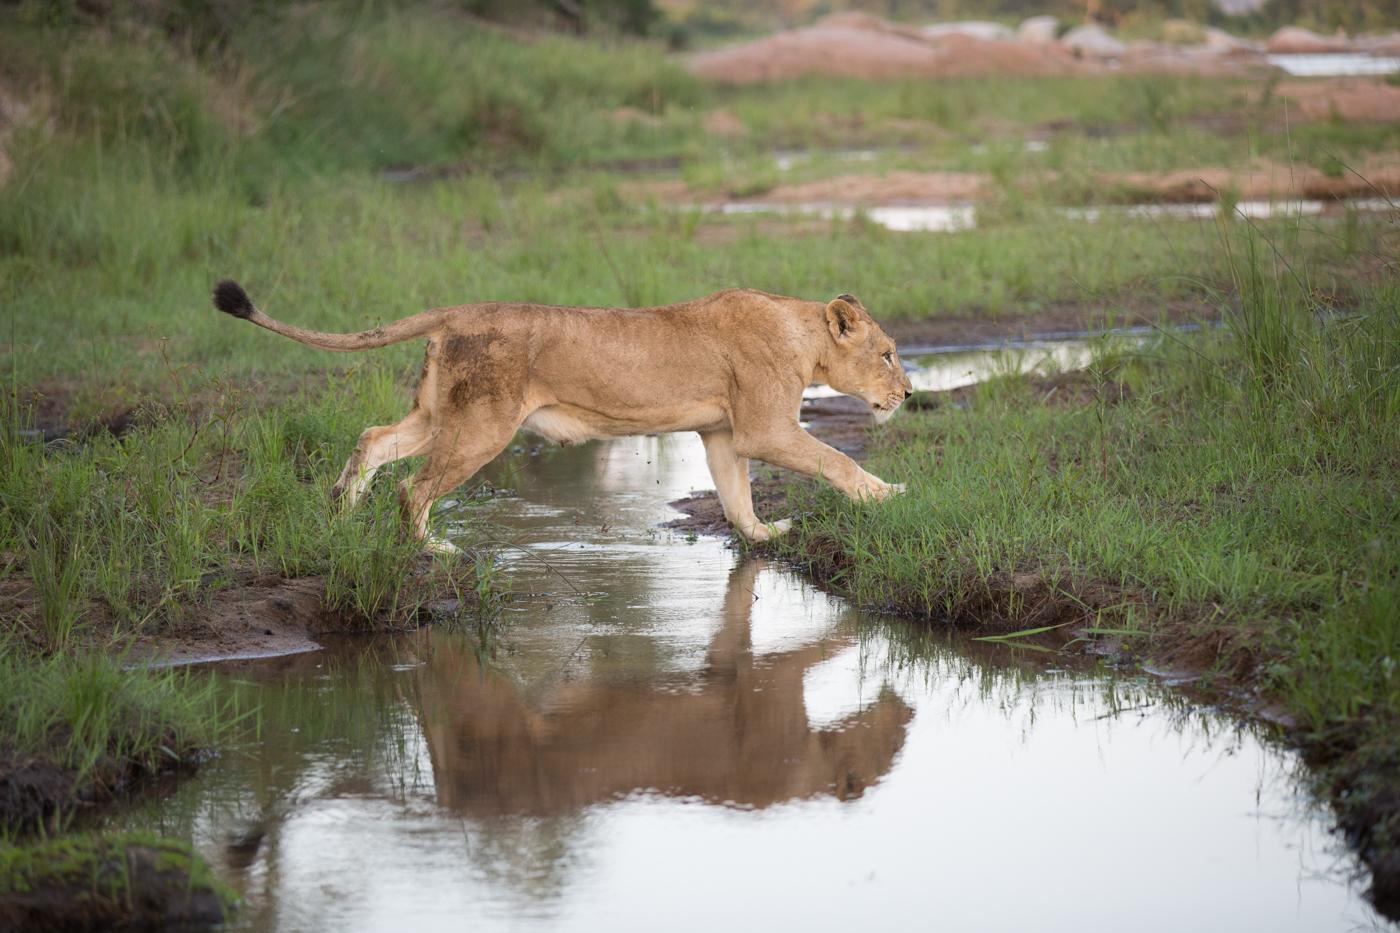 Tsalala Lion Cross Water